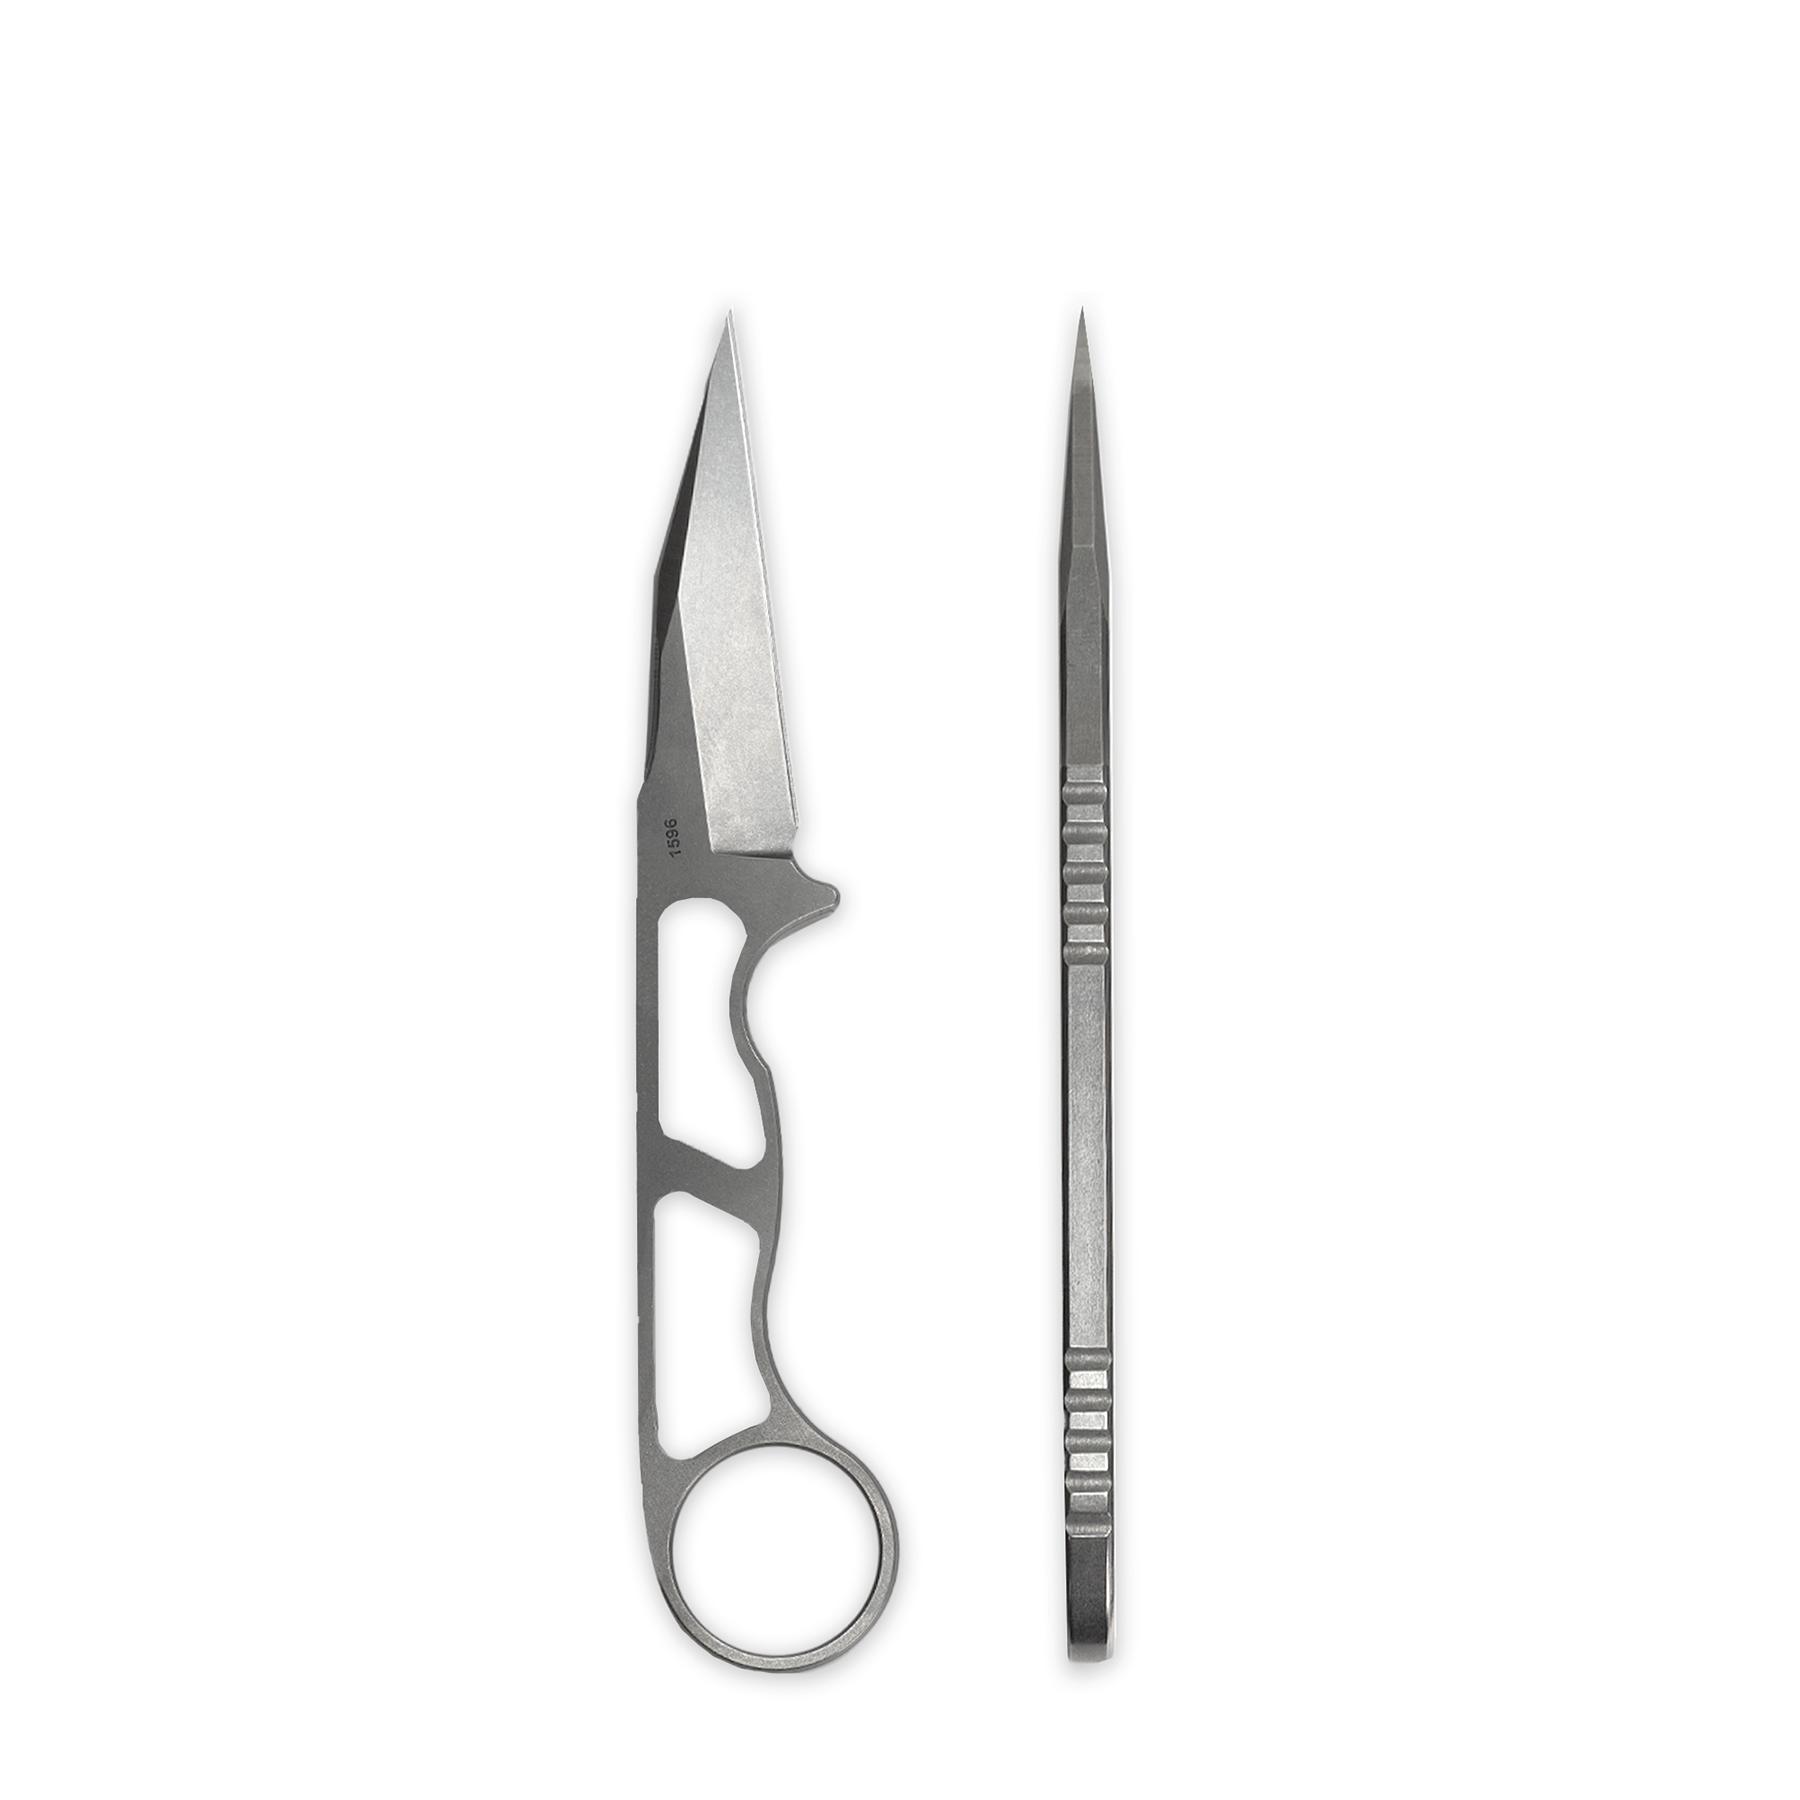 Toor Knives Jank Shank - Slate